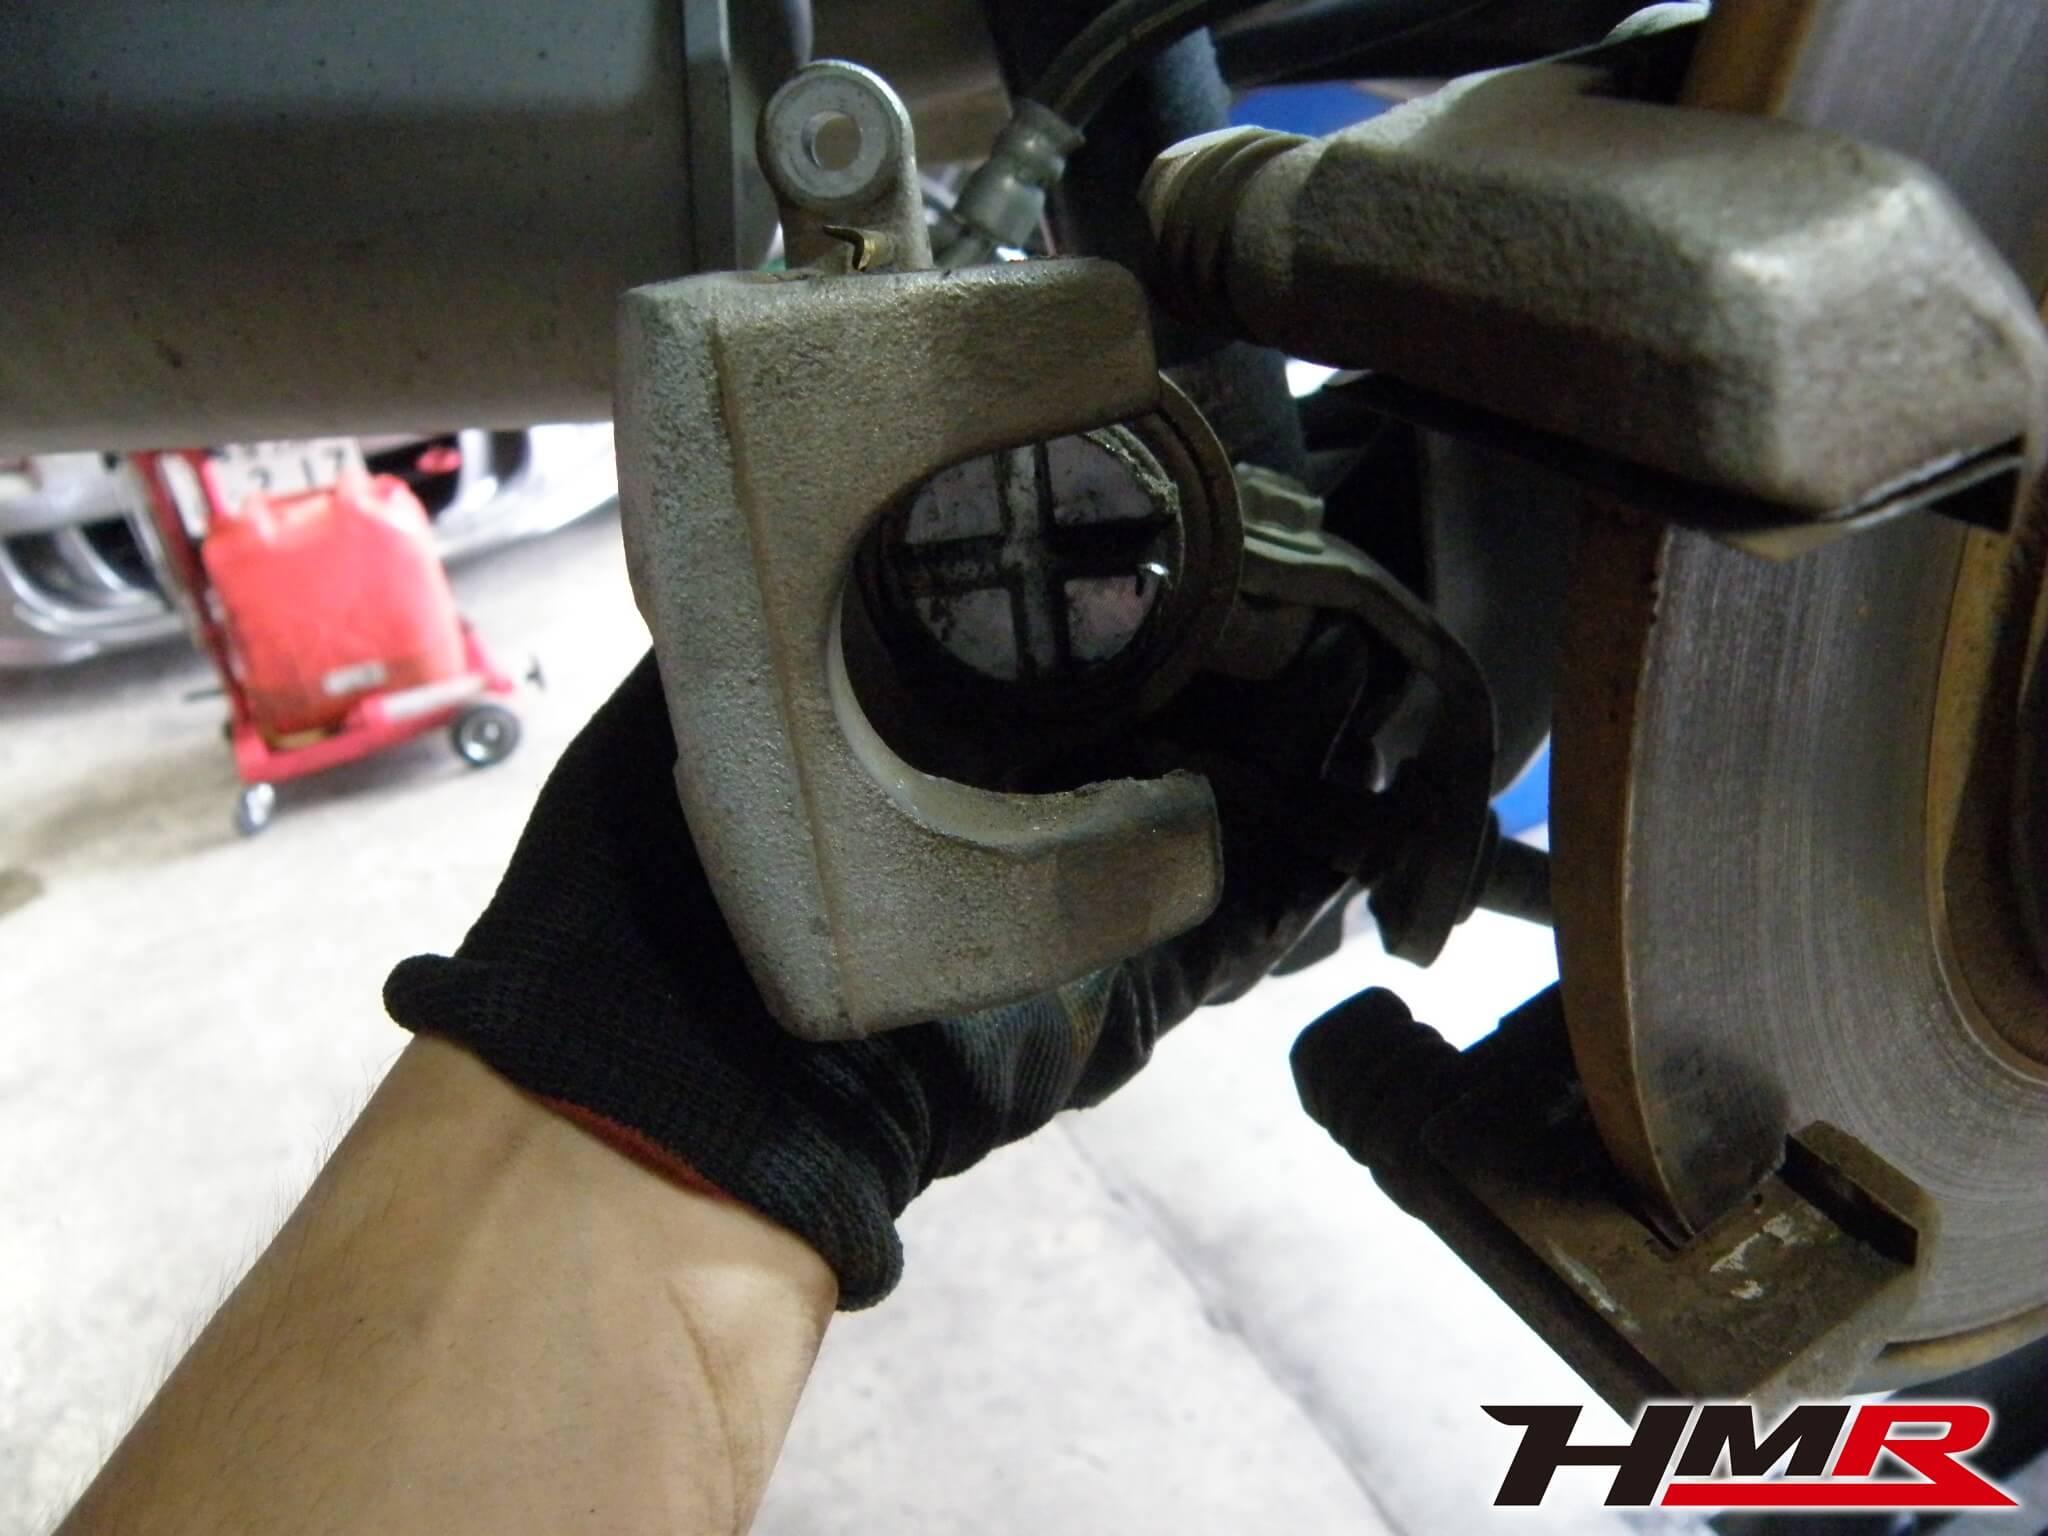 CR-Z 納車前整備 ブレーキ点検